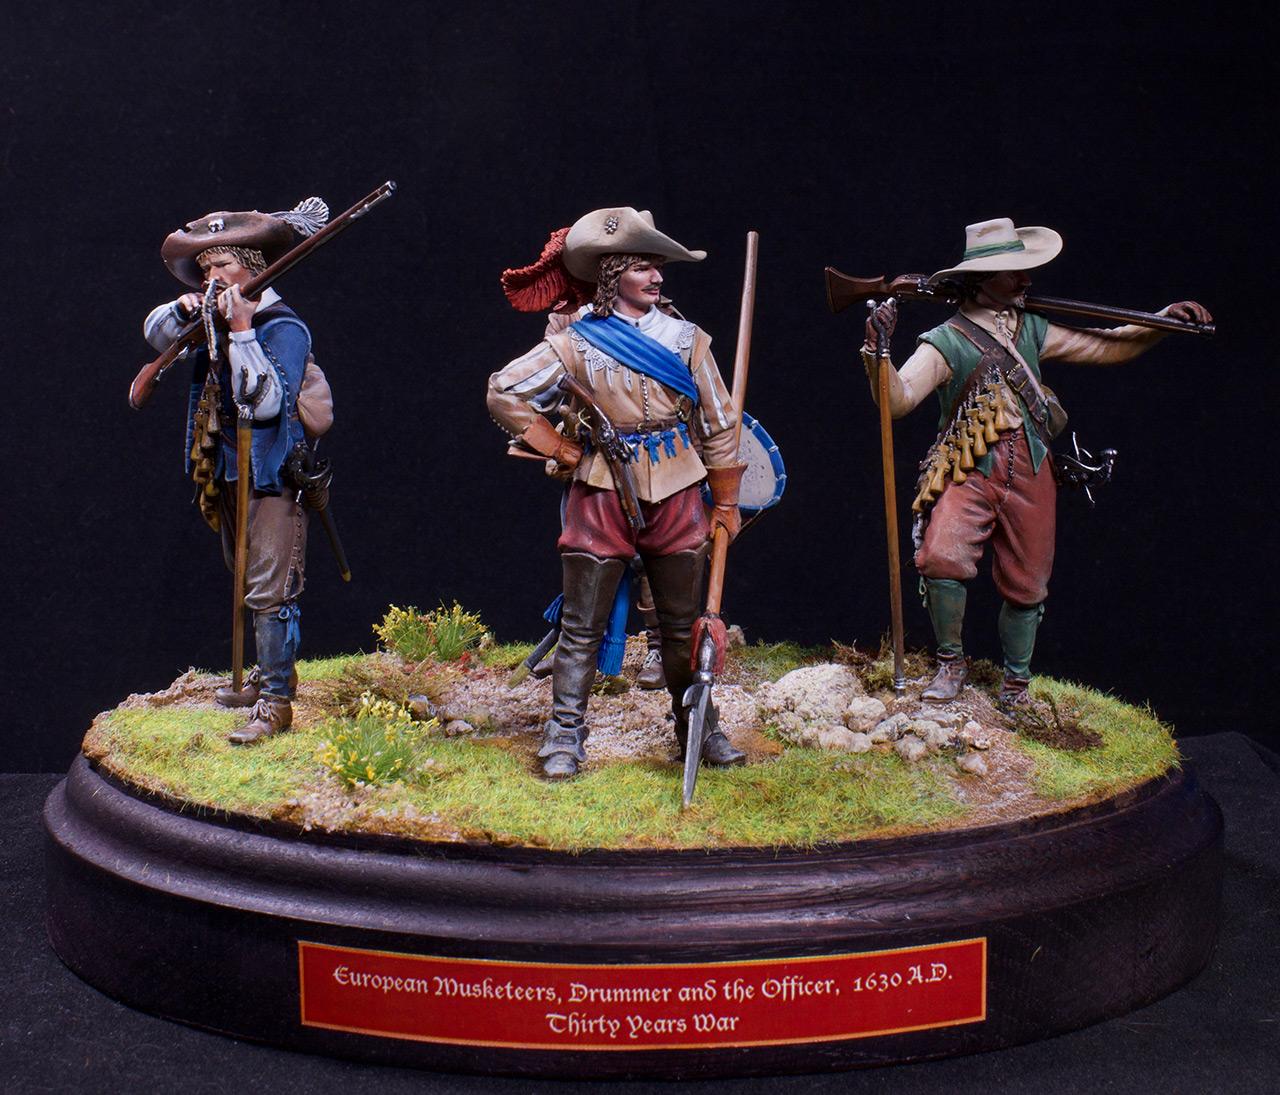 Фигурки: Мушкетеры, барабанщик и офицер, 1630 г. , фото #2